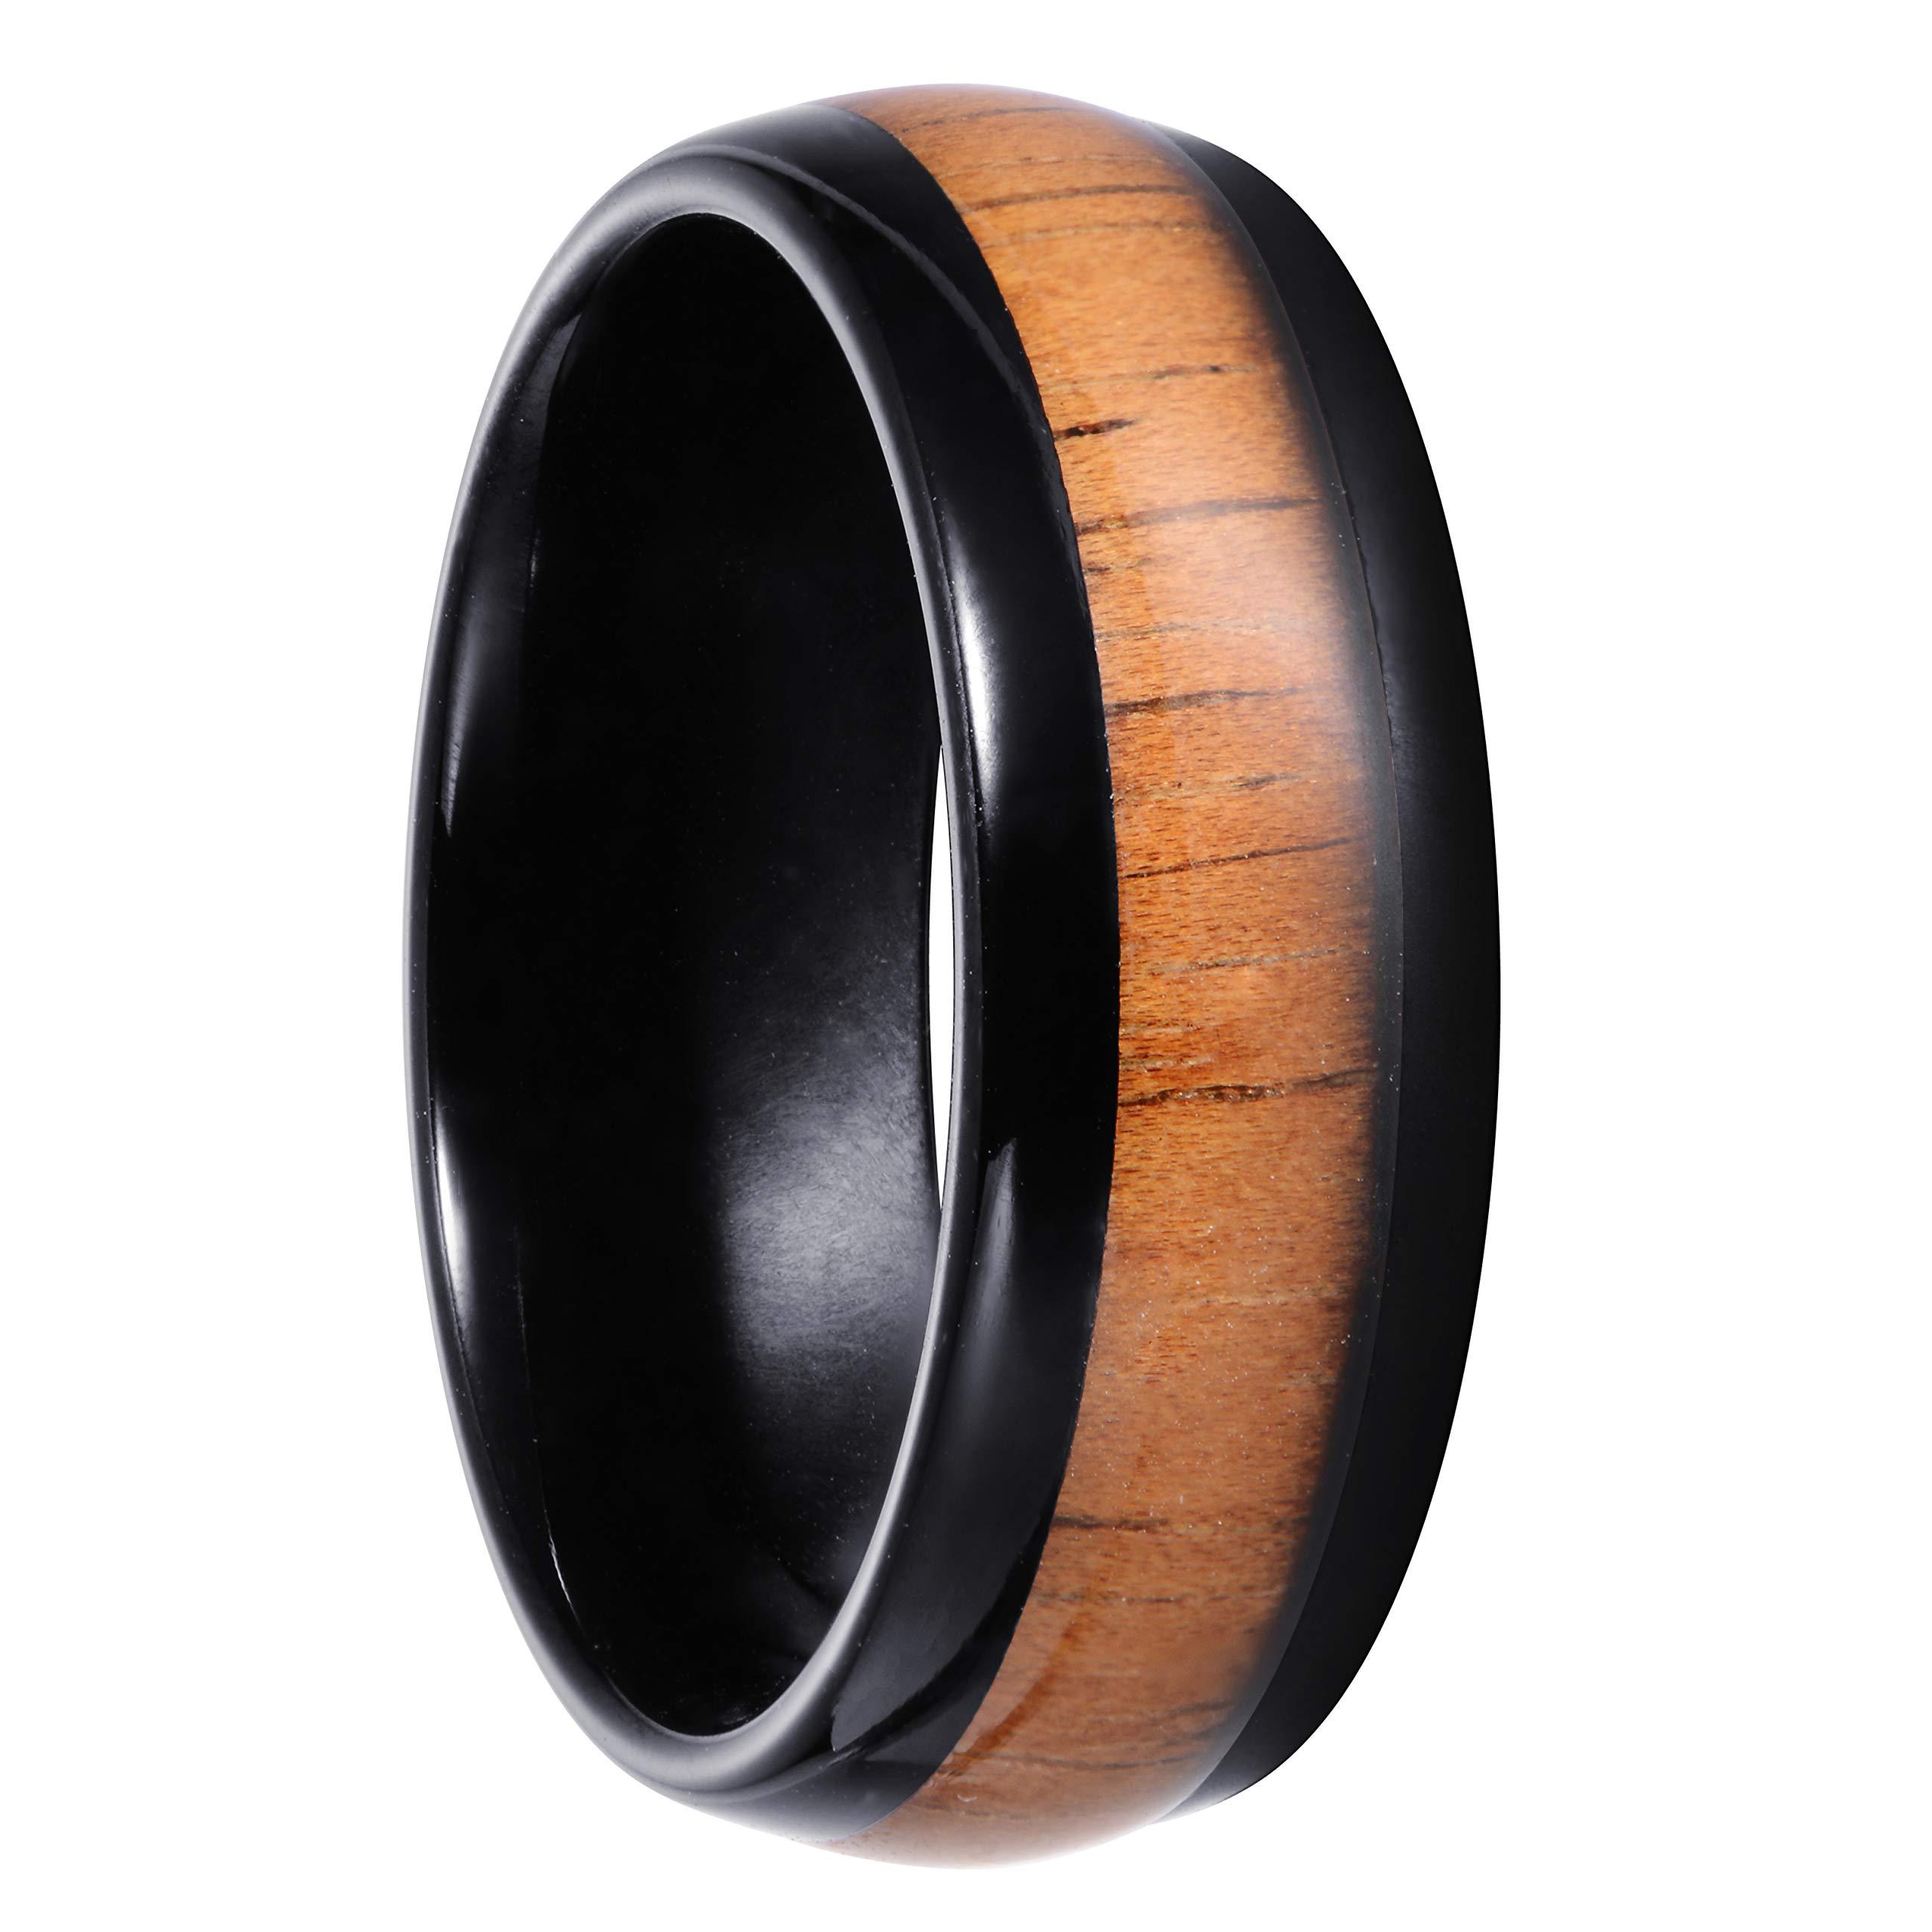 ELGNT Designs 8mm Black Koa Wood Gloss Tungsten Mens Wedding Ring Band | Mens Wedding Band | Engagement Ring | Promise Ring | Size 9.5